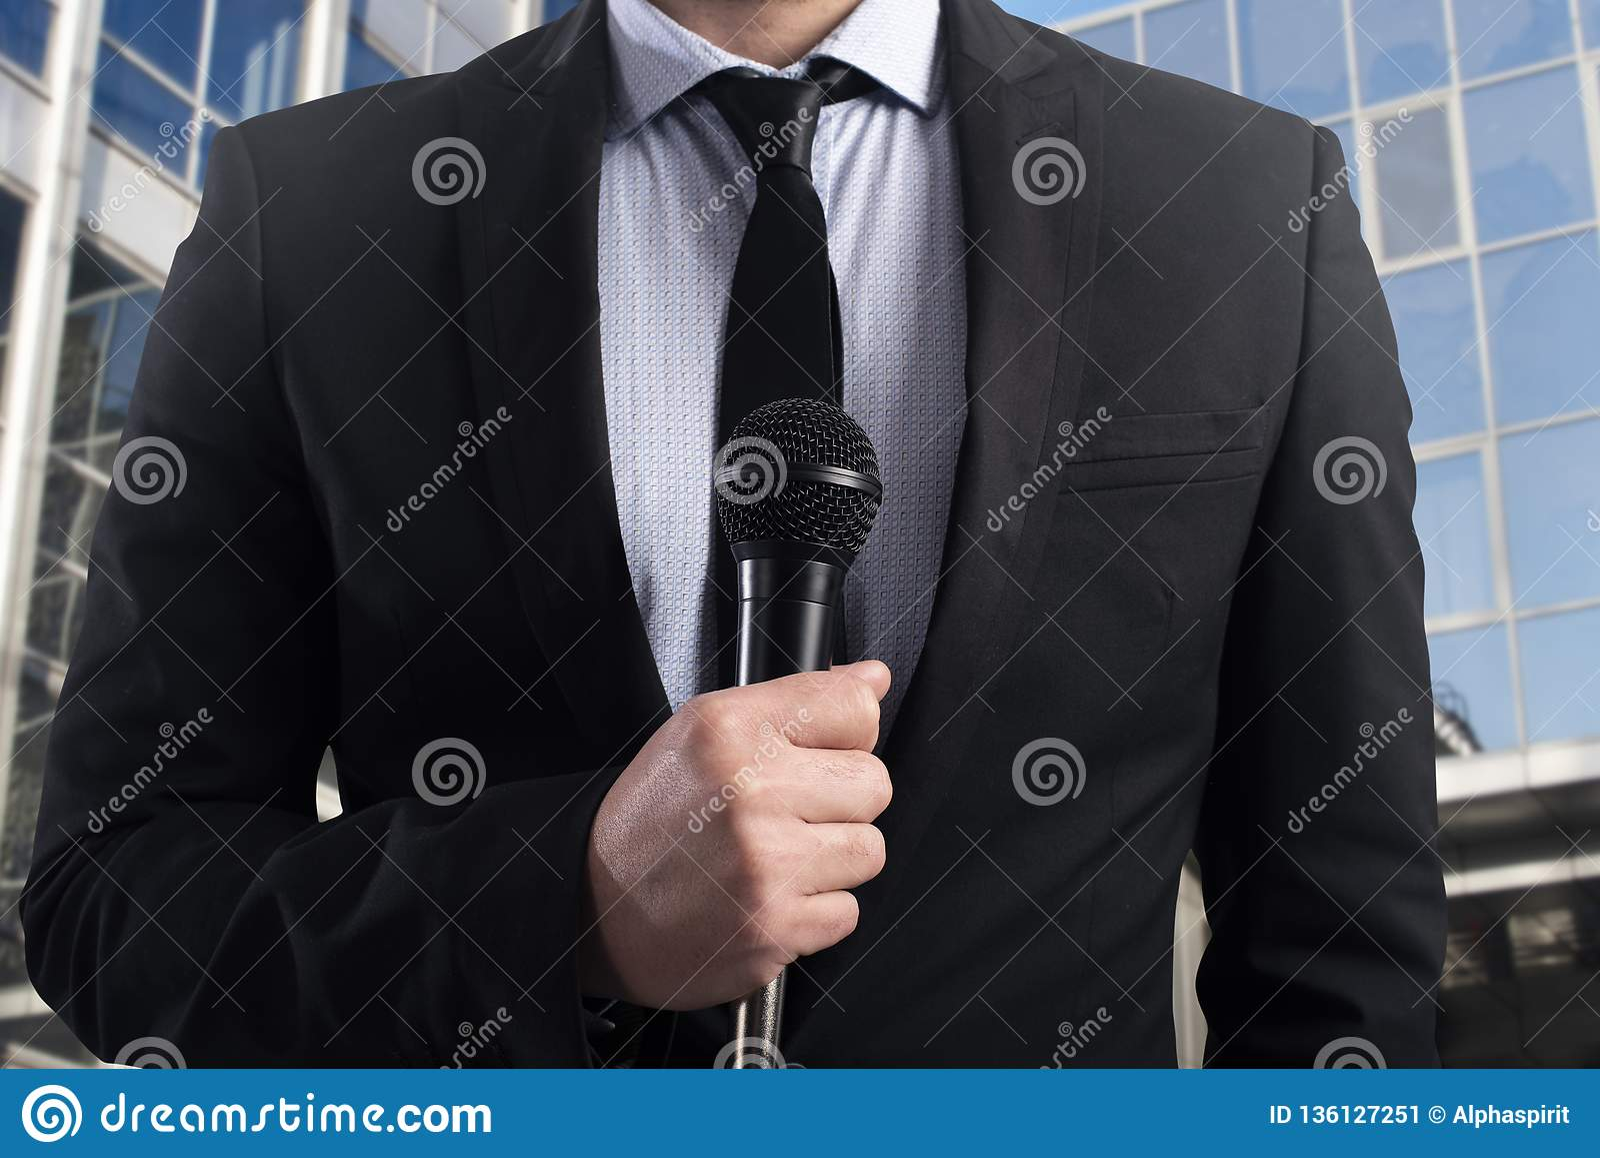 Elegant Businessman ready to speak with microphone